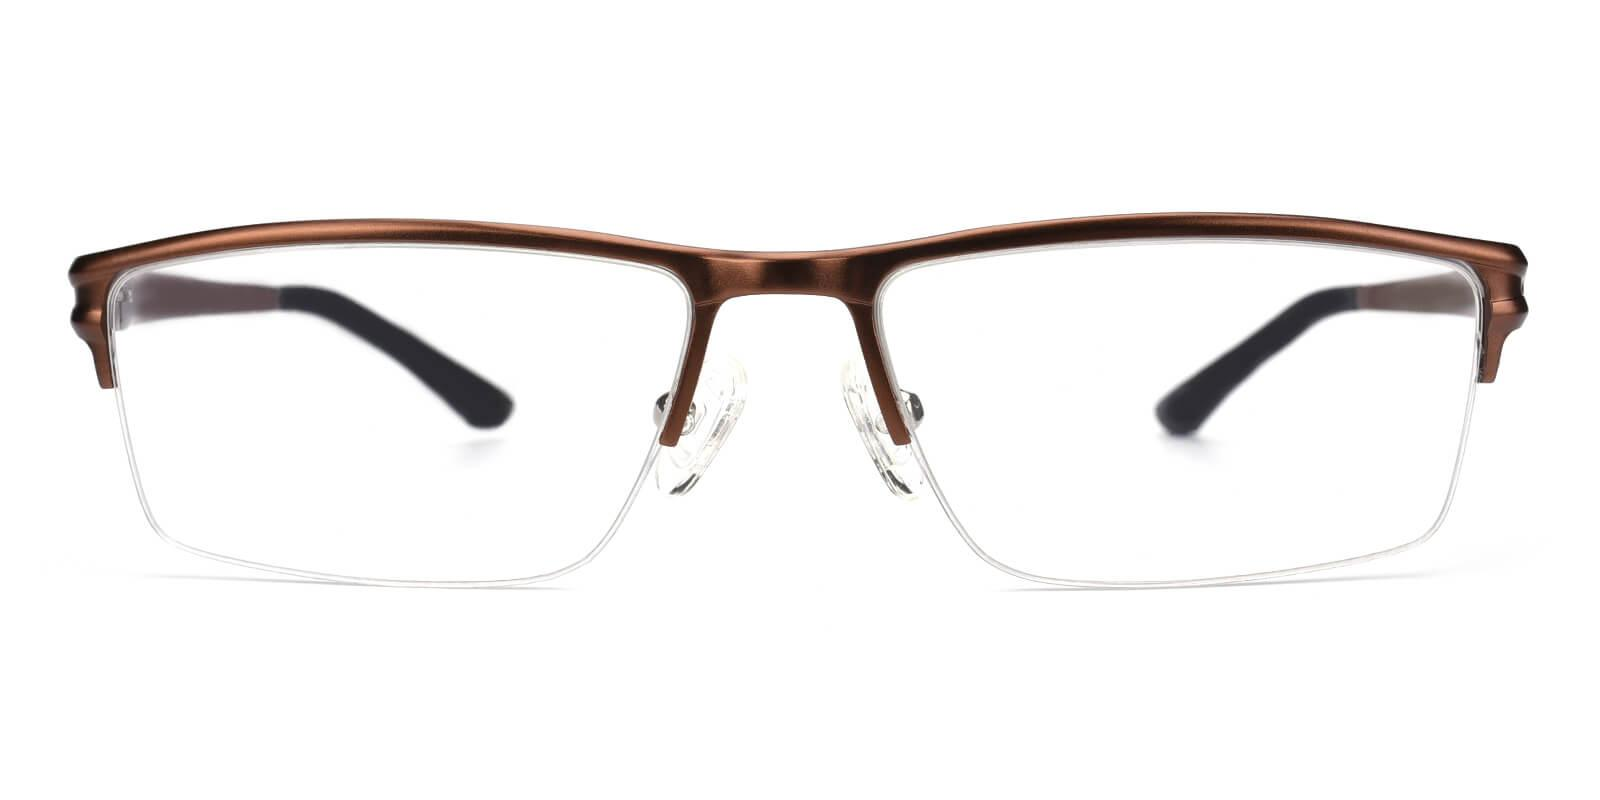 Leonado-Brown-Rectangle-Metal-Eyeglasses-additional2